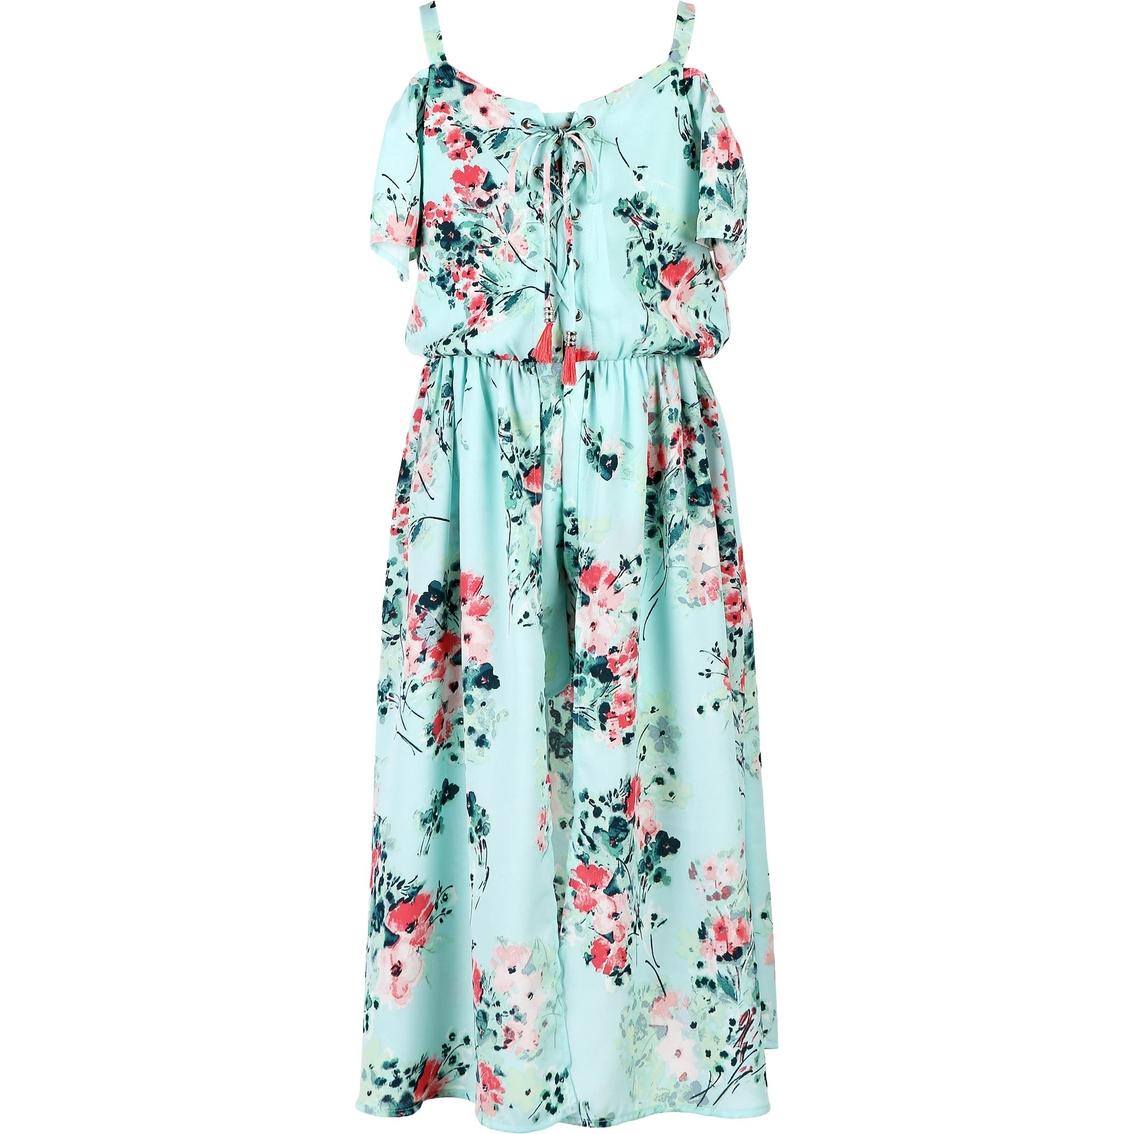 d20674bda Speechless Girls Floral Chiffon Romper Dress | Girls 7-16 | Apparel ...